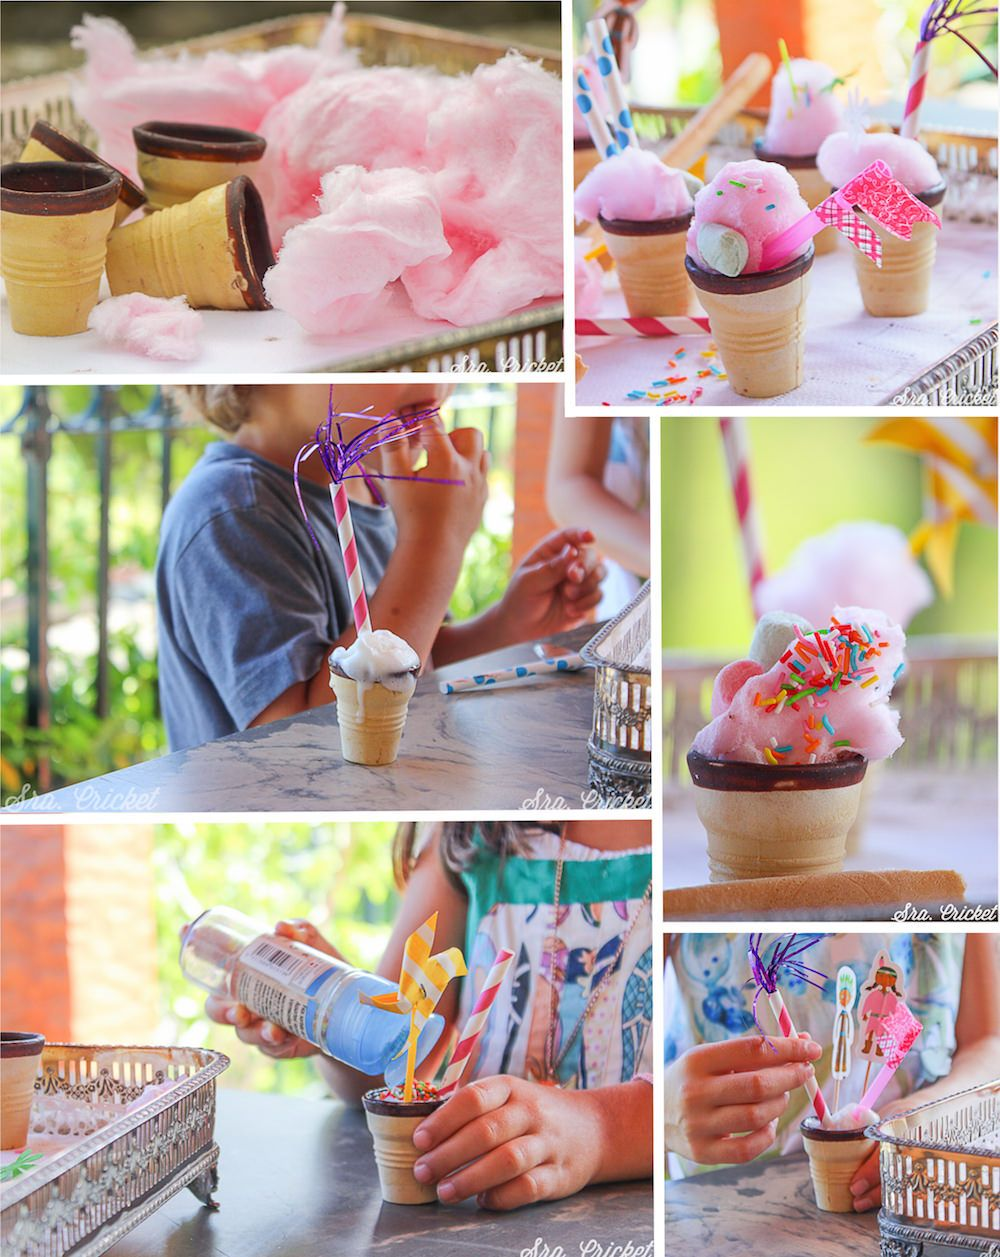 Algodón de azúcar en conos para fiesttas infantiles